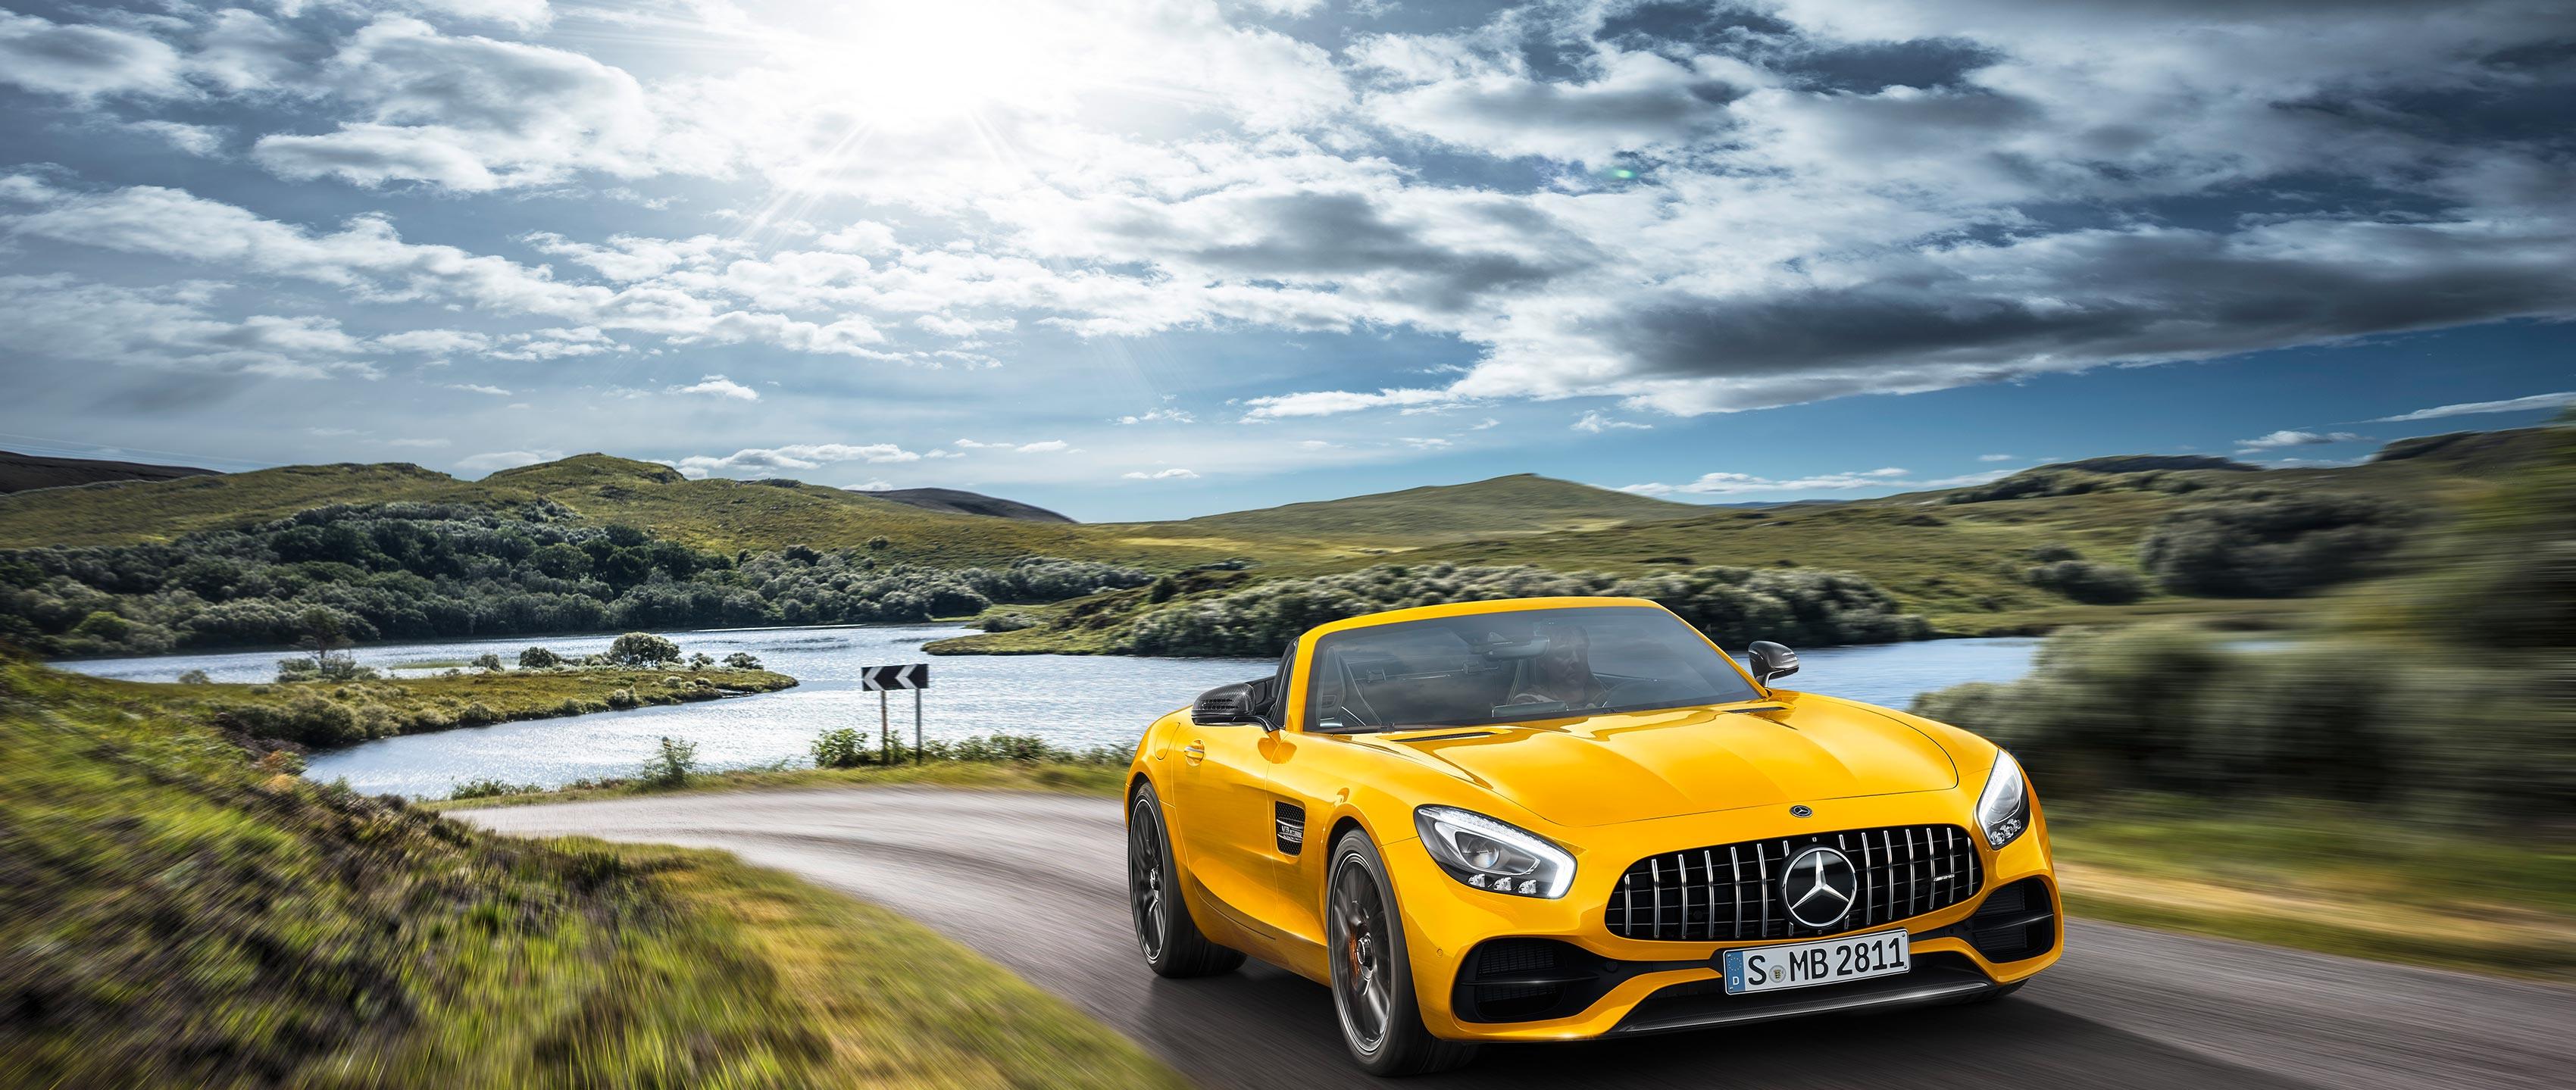 Новый Mercedes-AMG GT S Roadster